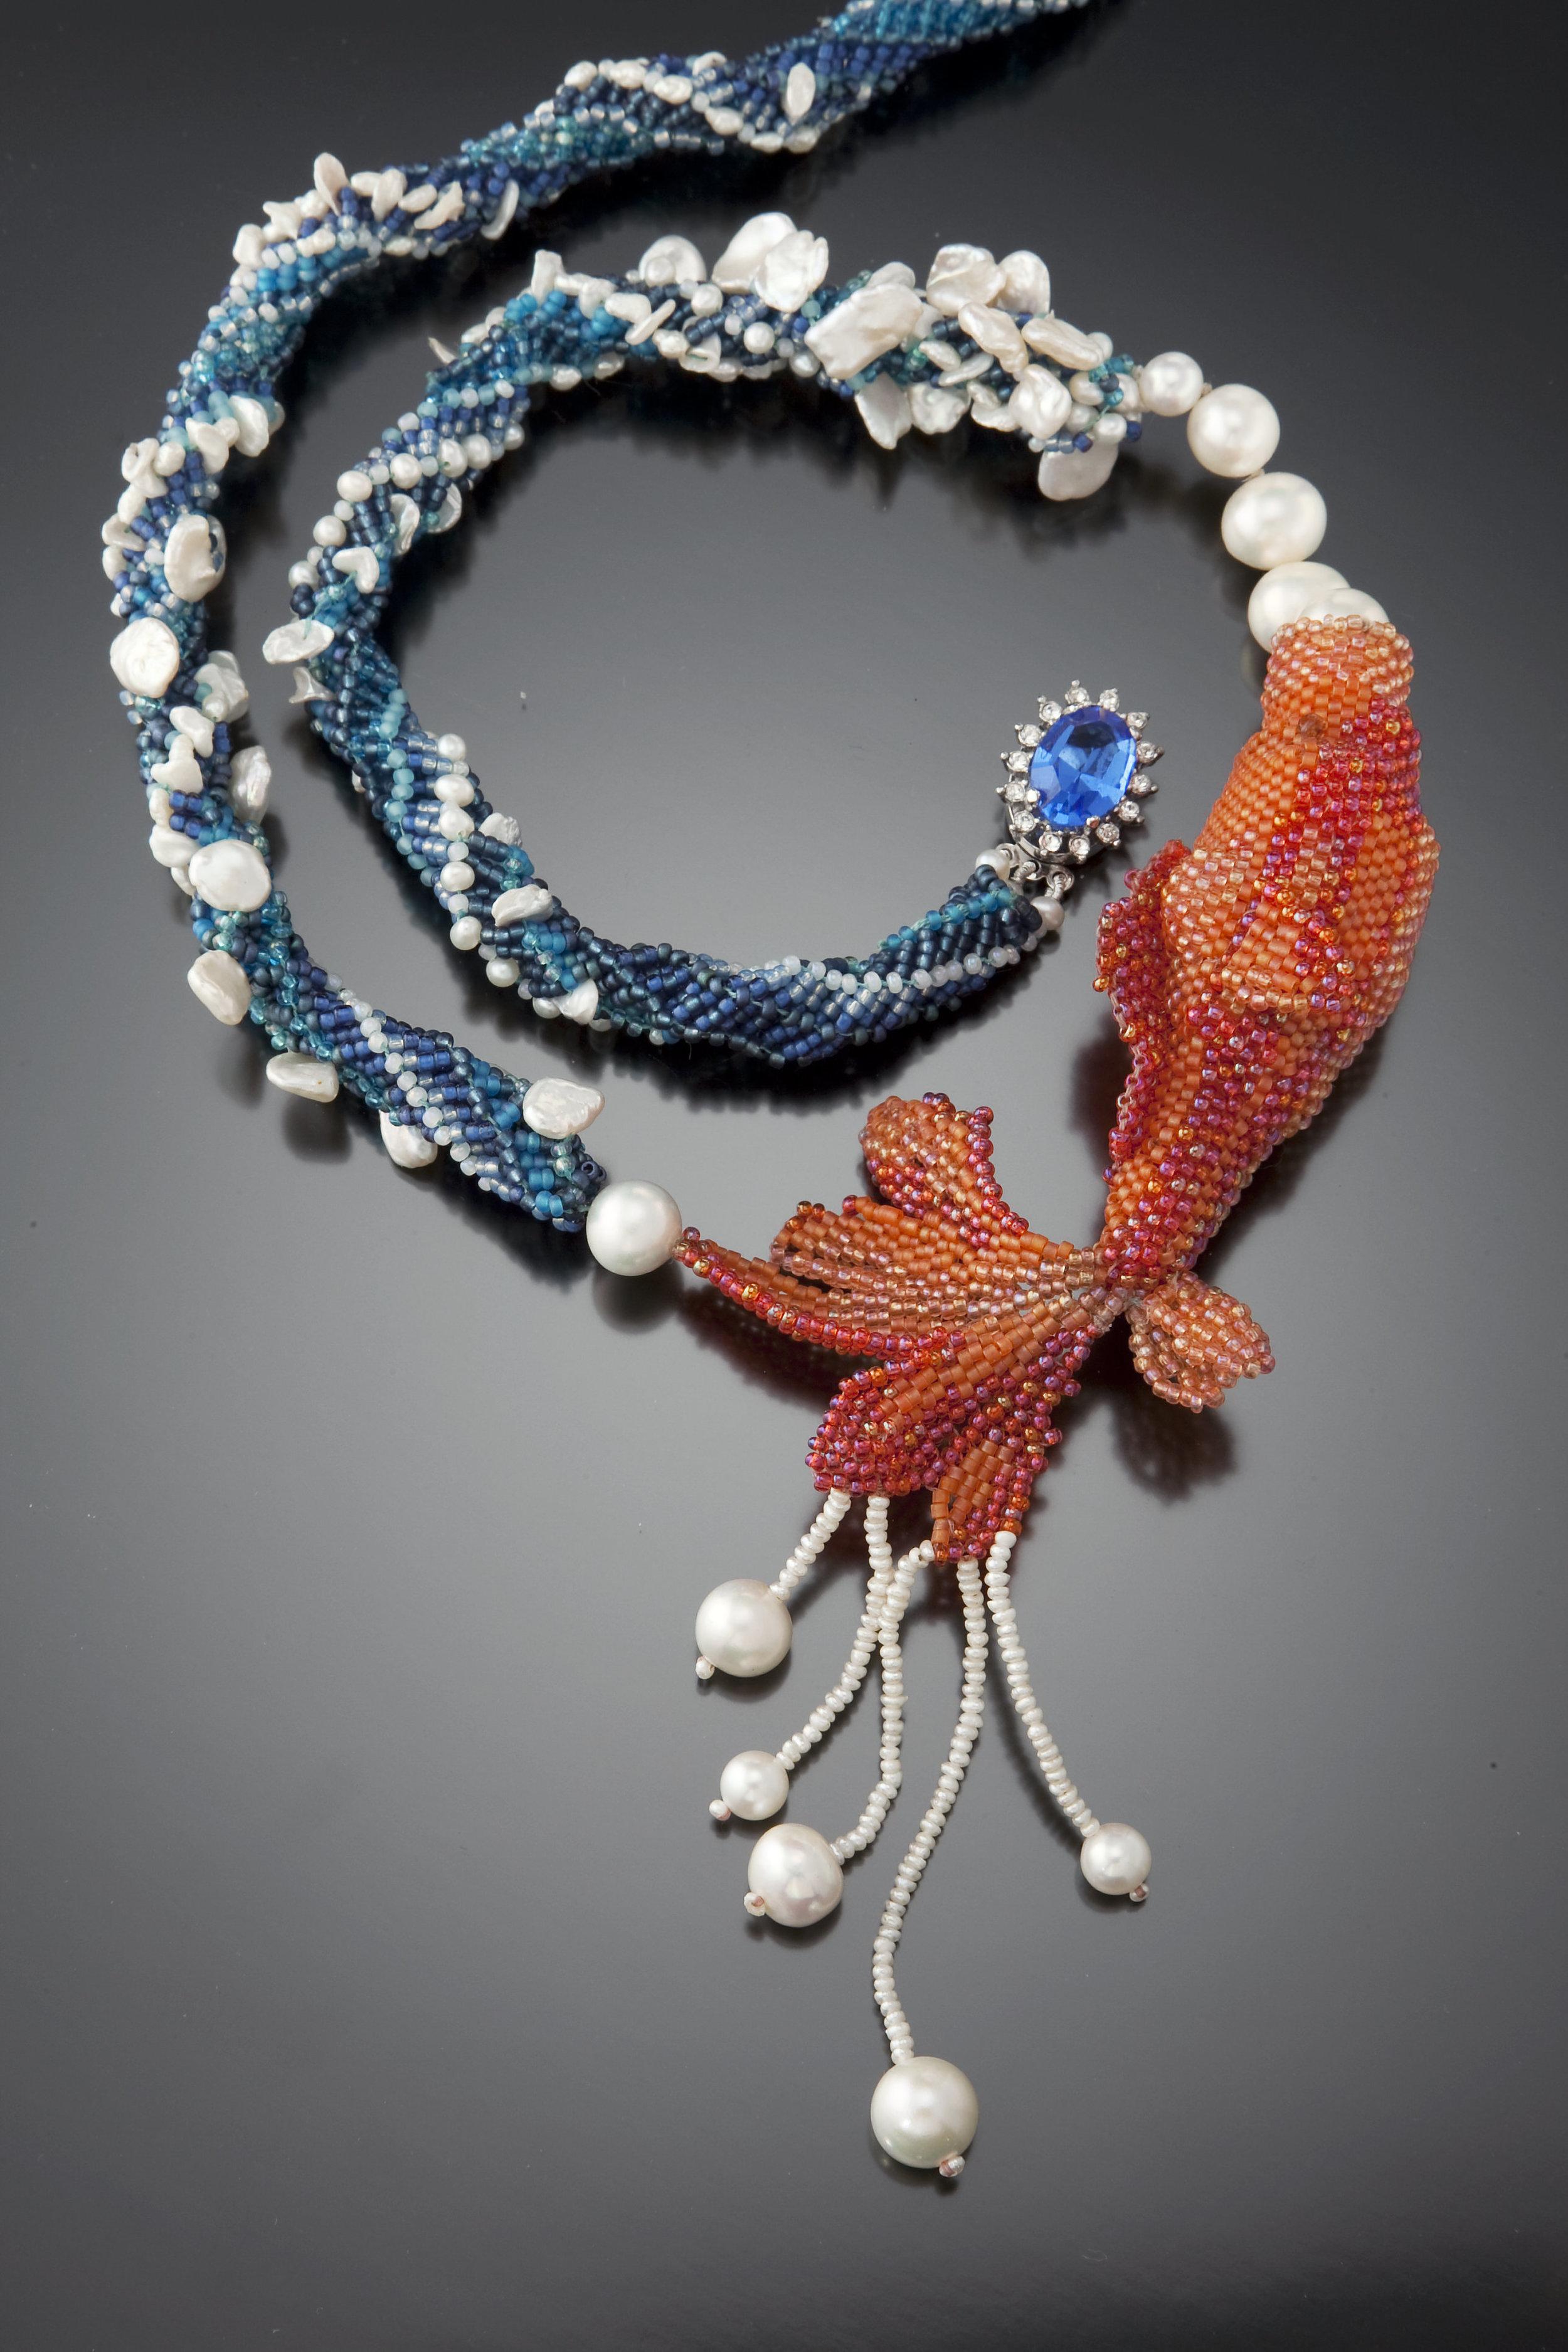 Kanagawa Koi - Sculptural Beadwoven Koi Necklace with Pearls a Plenty